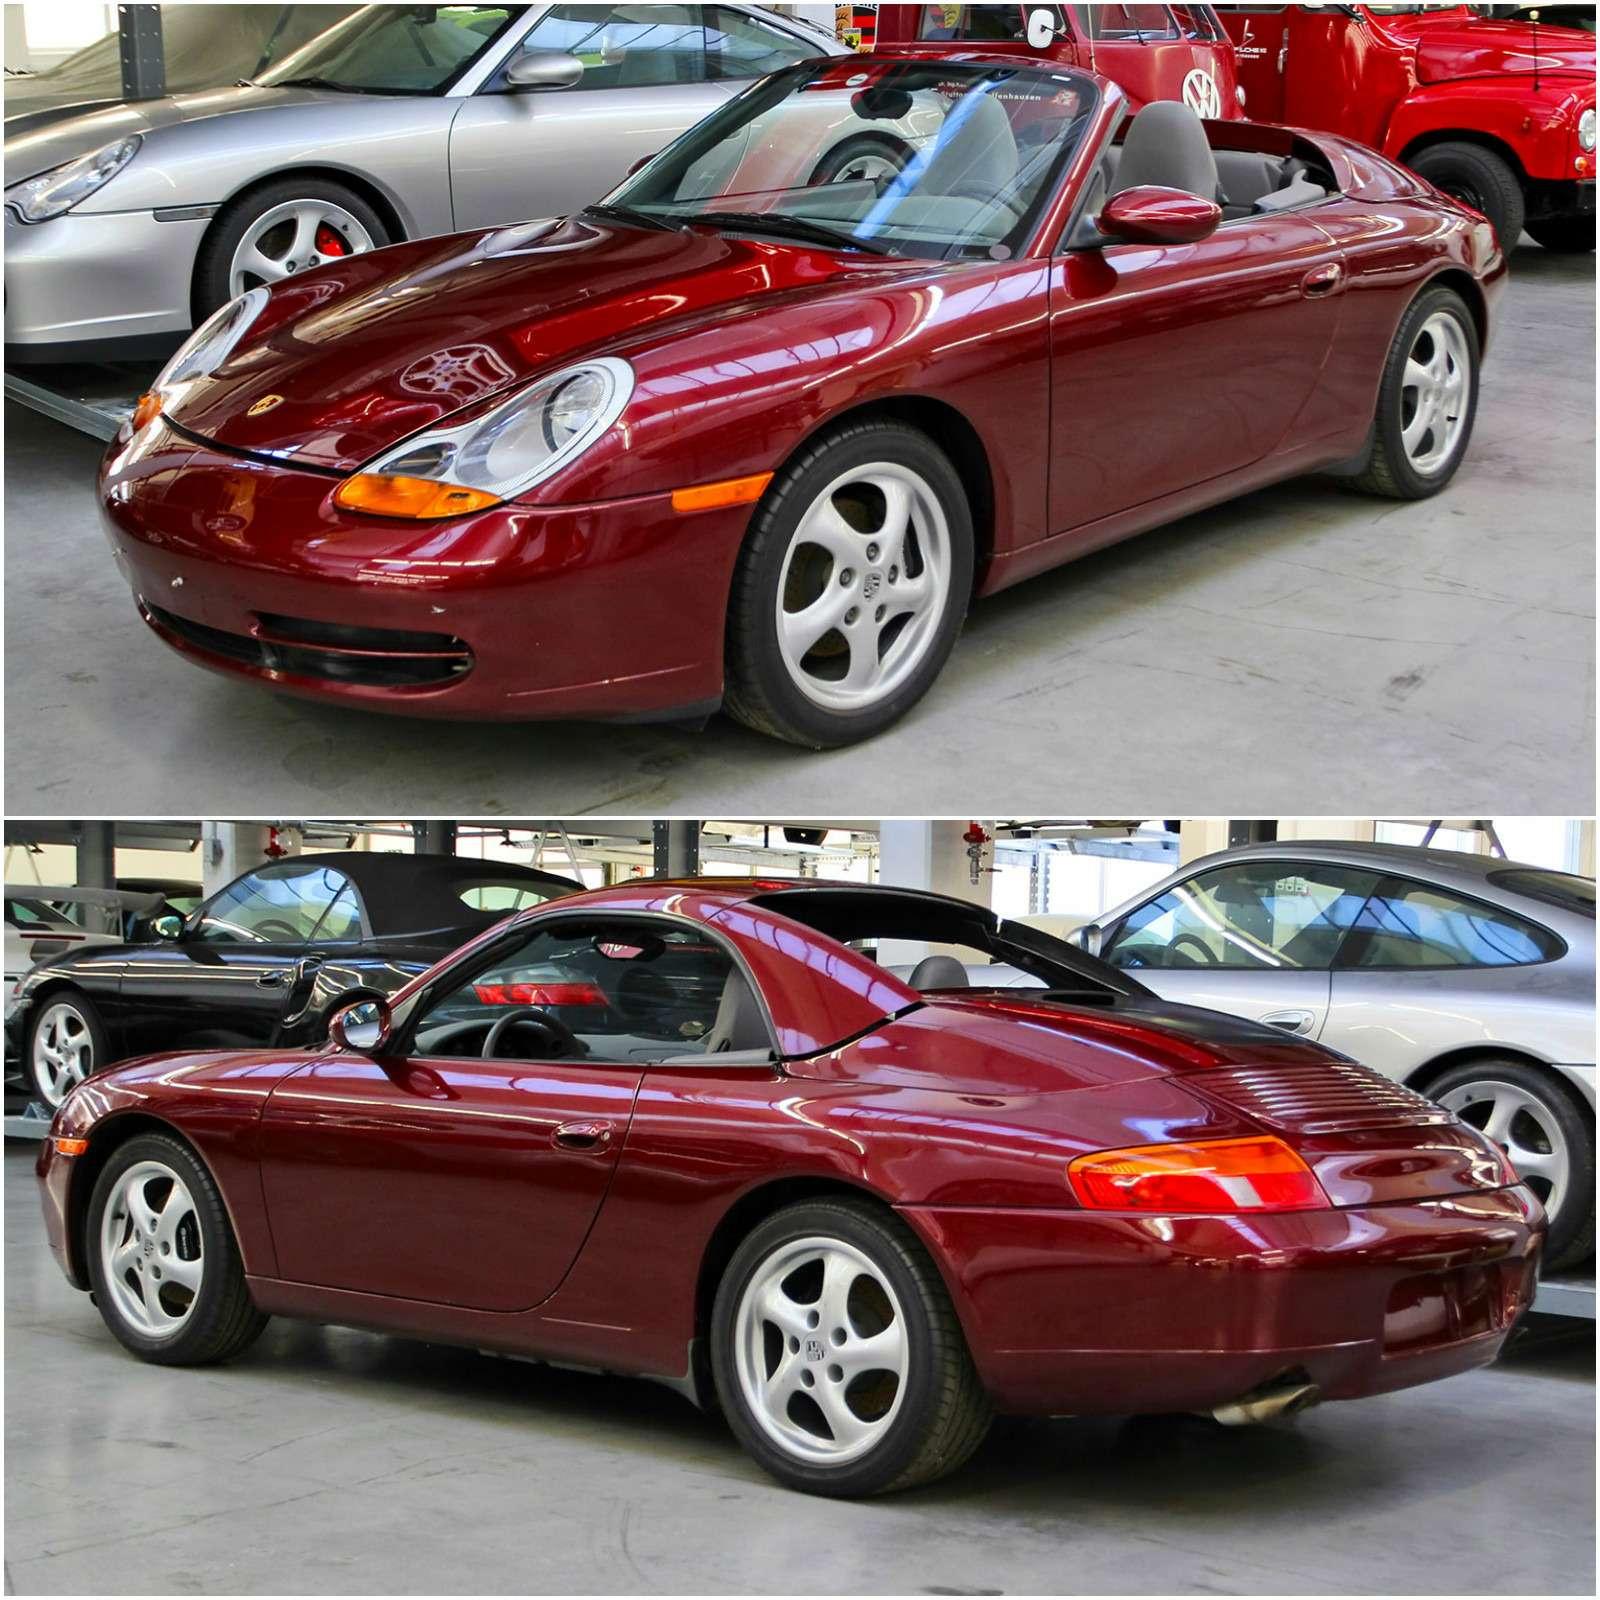 Секретный гараж Porsche: Лада Самара идругие— фото 700193